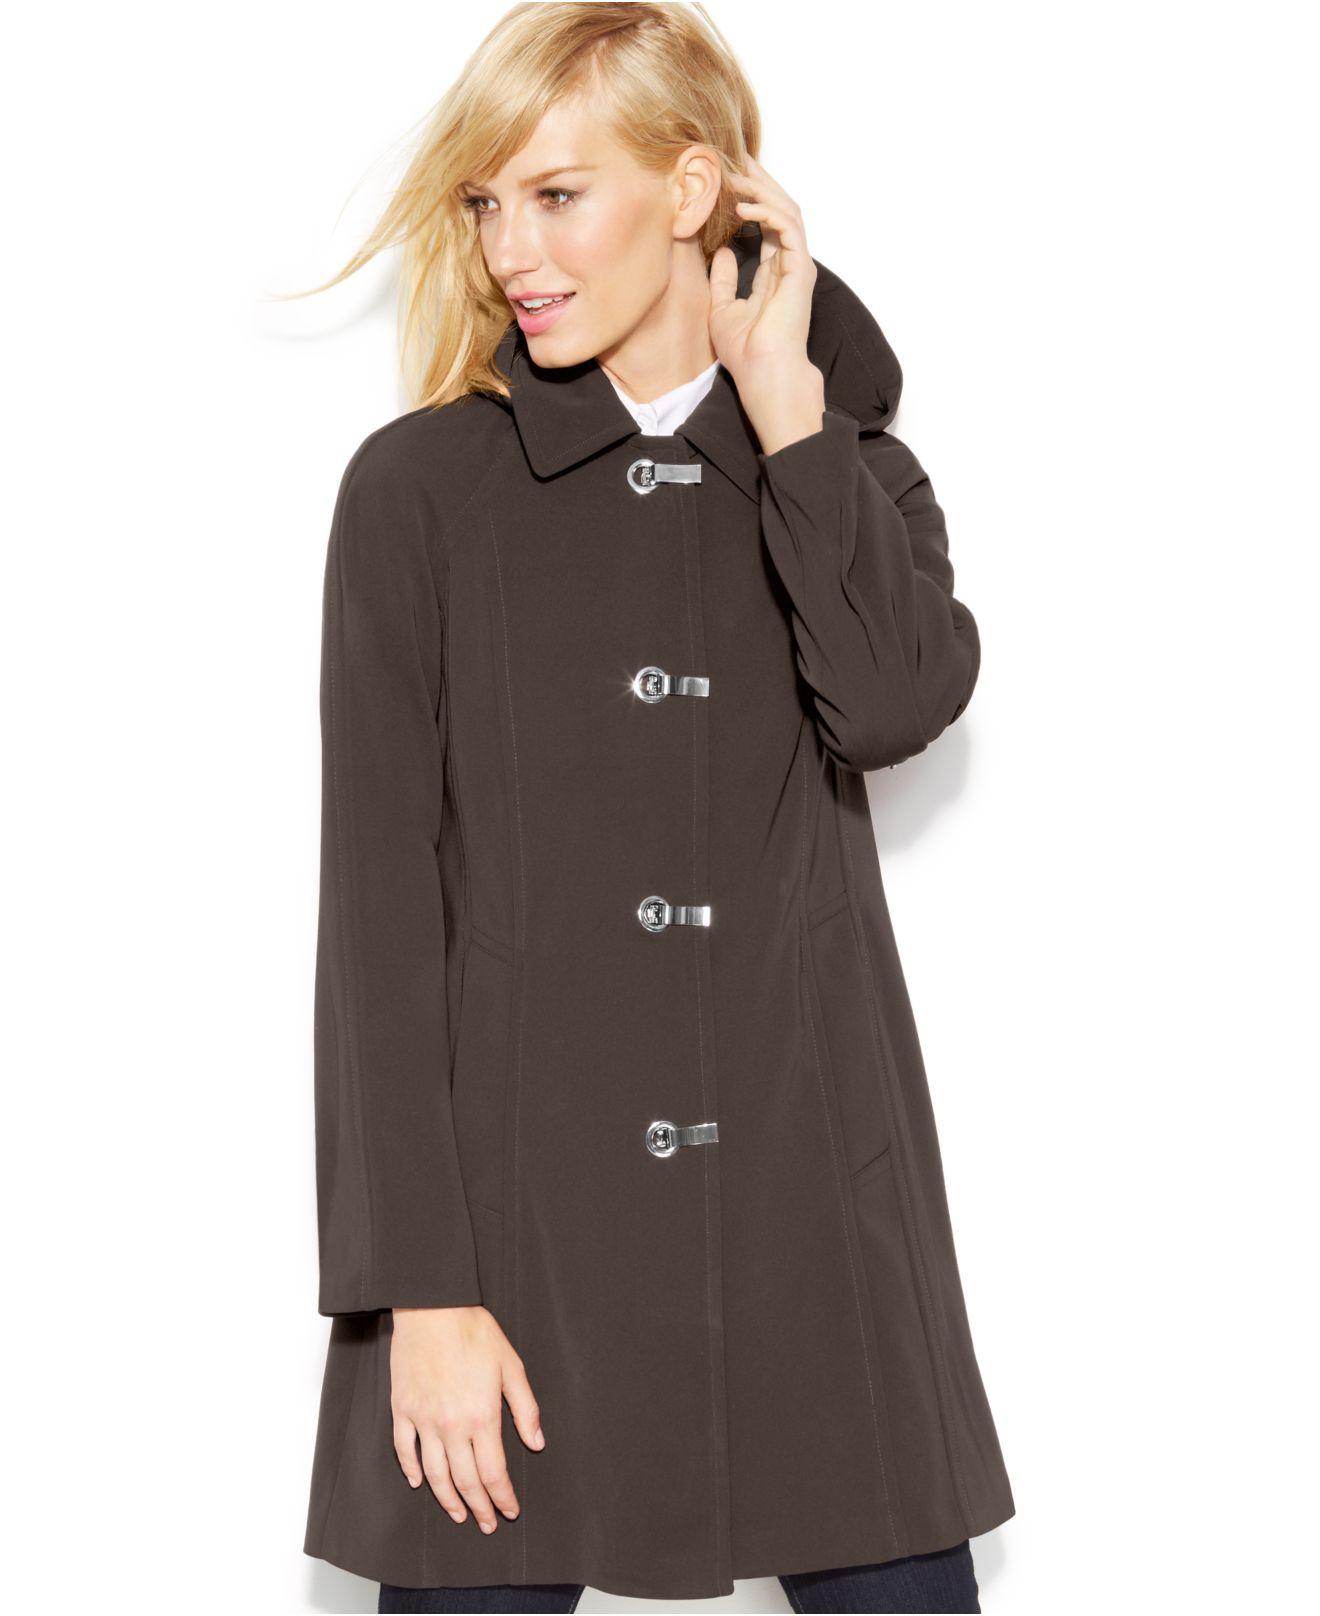 978e7b8922b Lyst - London Fog A-Line Raincoat in Brown